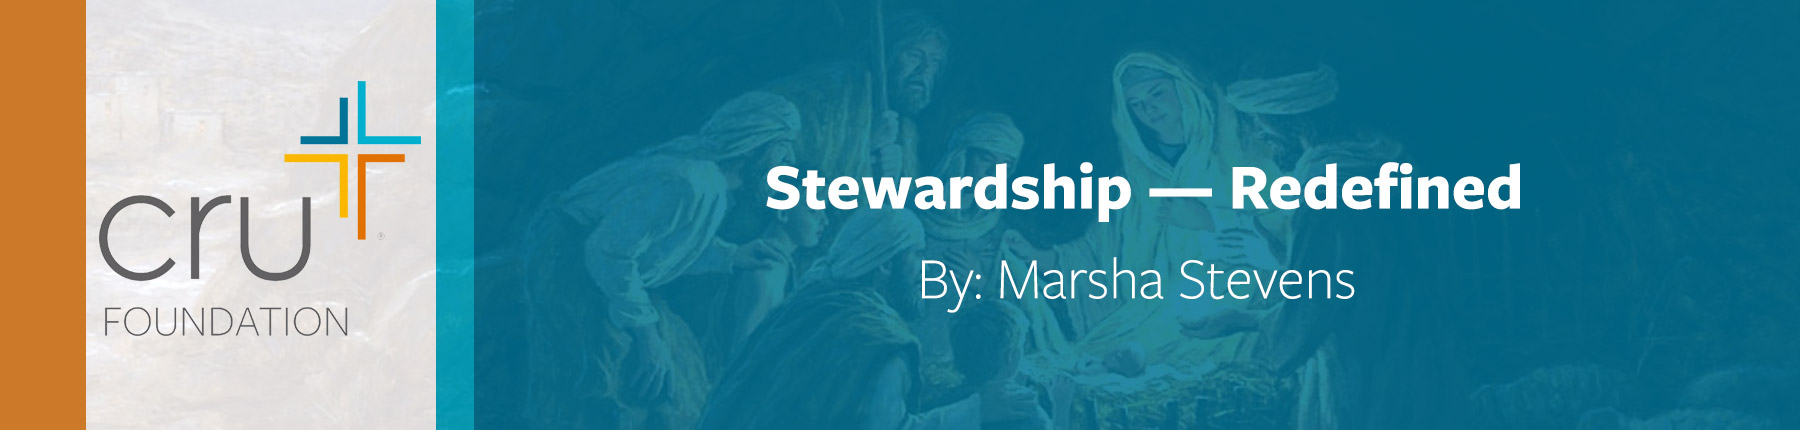 Marsha Stevens: Stewardship - Redefined